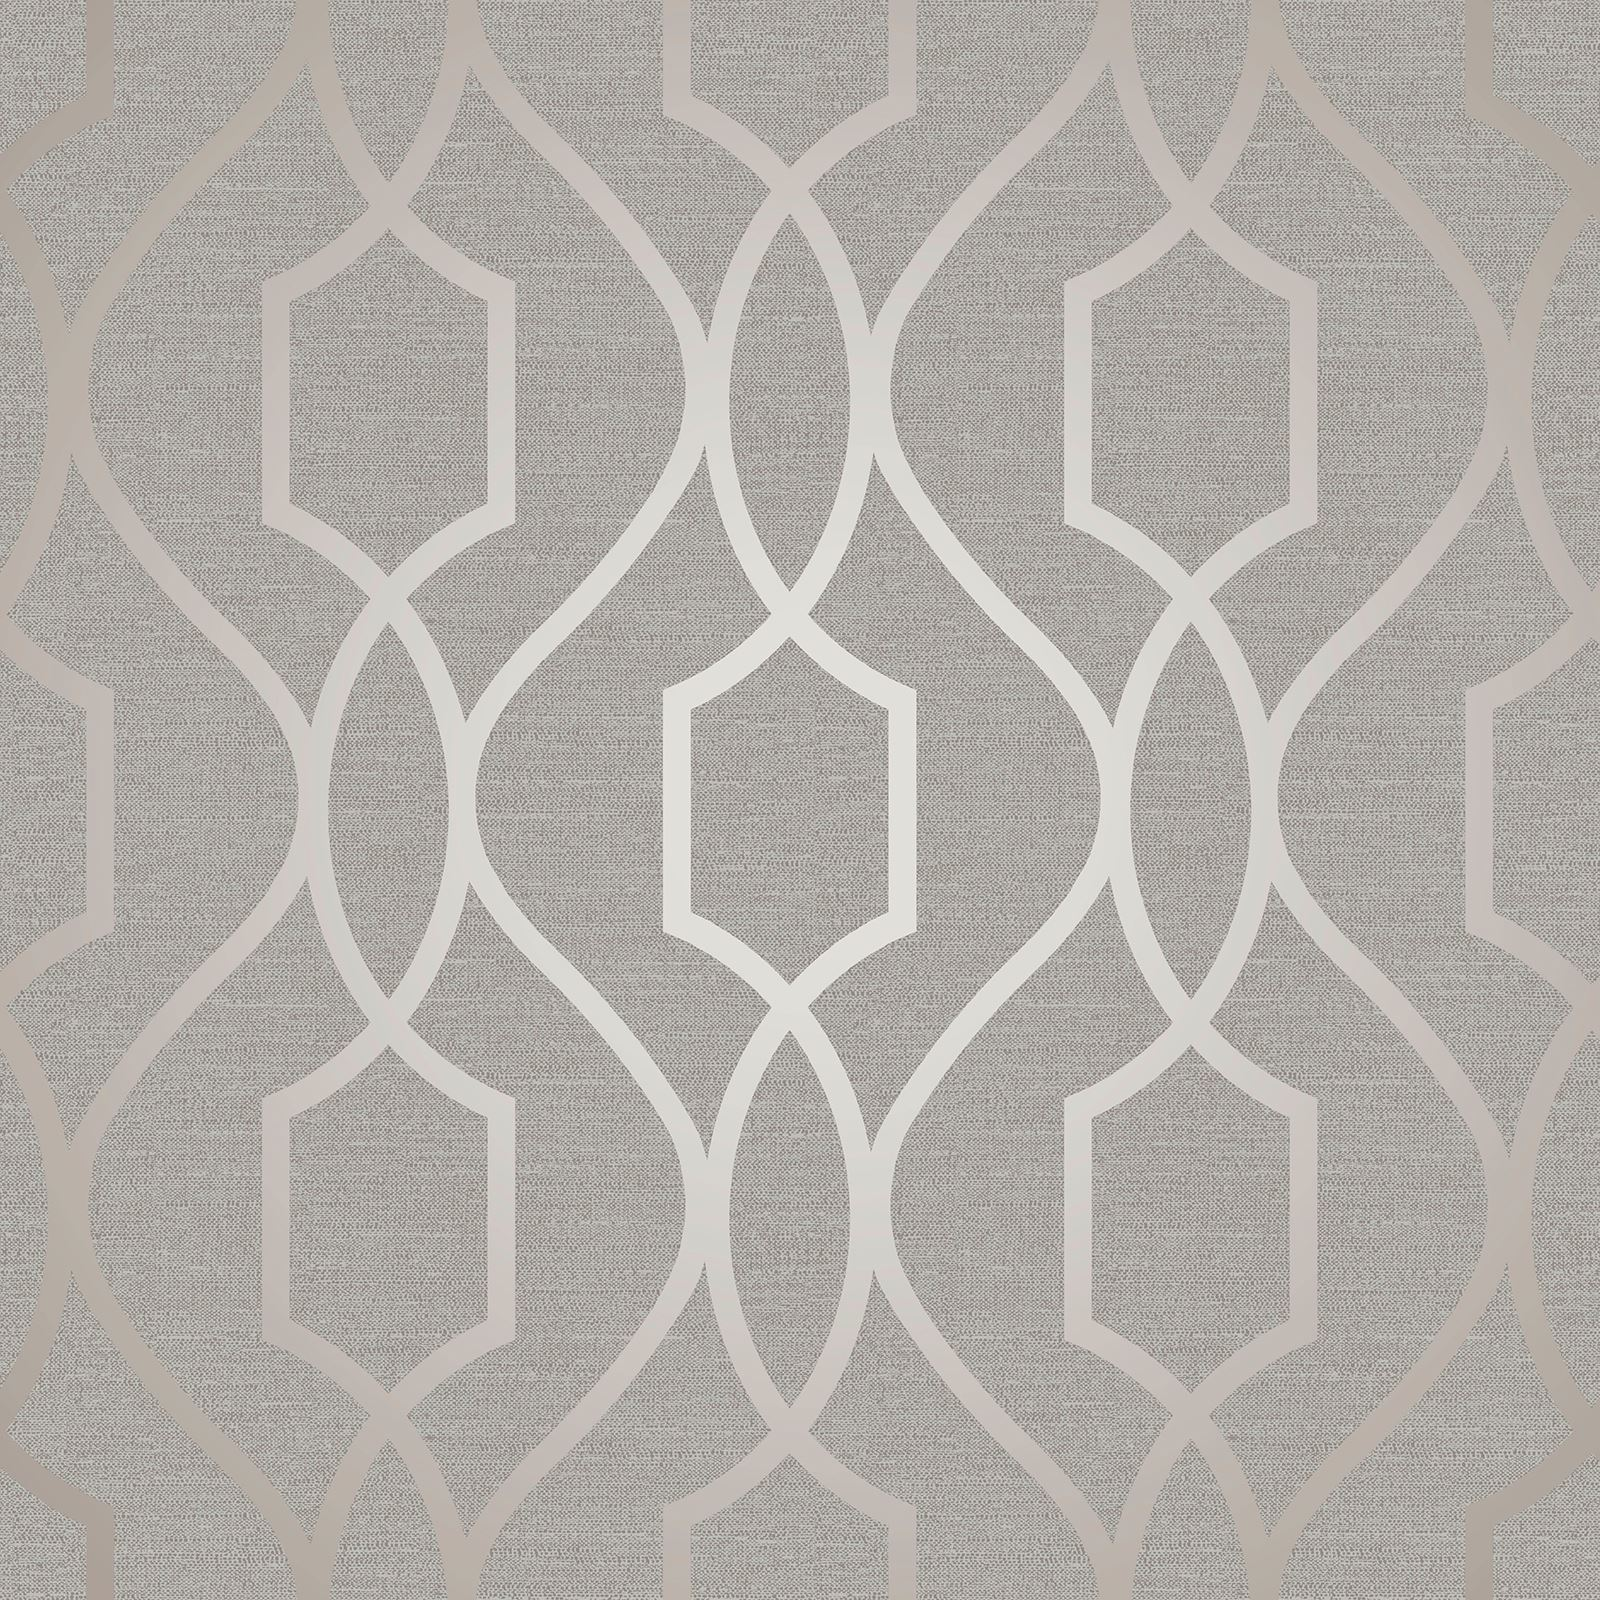 fine decor apex geometric trellis wallpaper stone grey silver more feature wall - Trellis Wall Paper